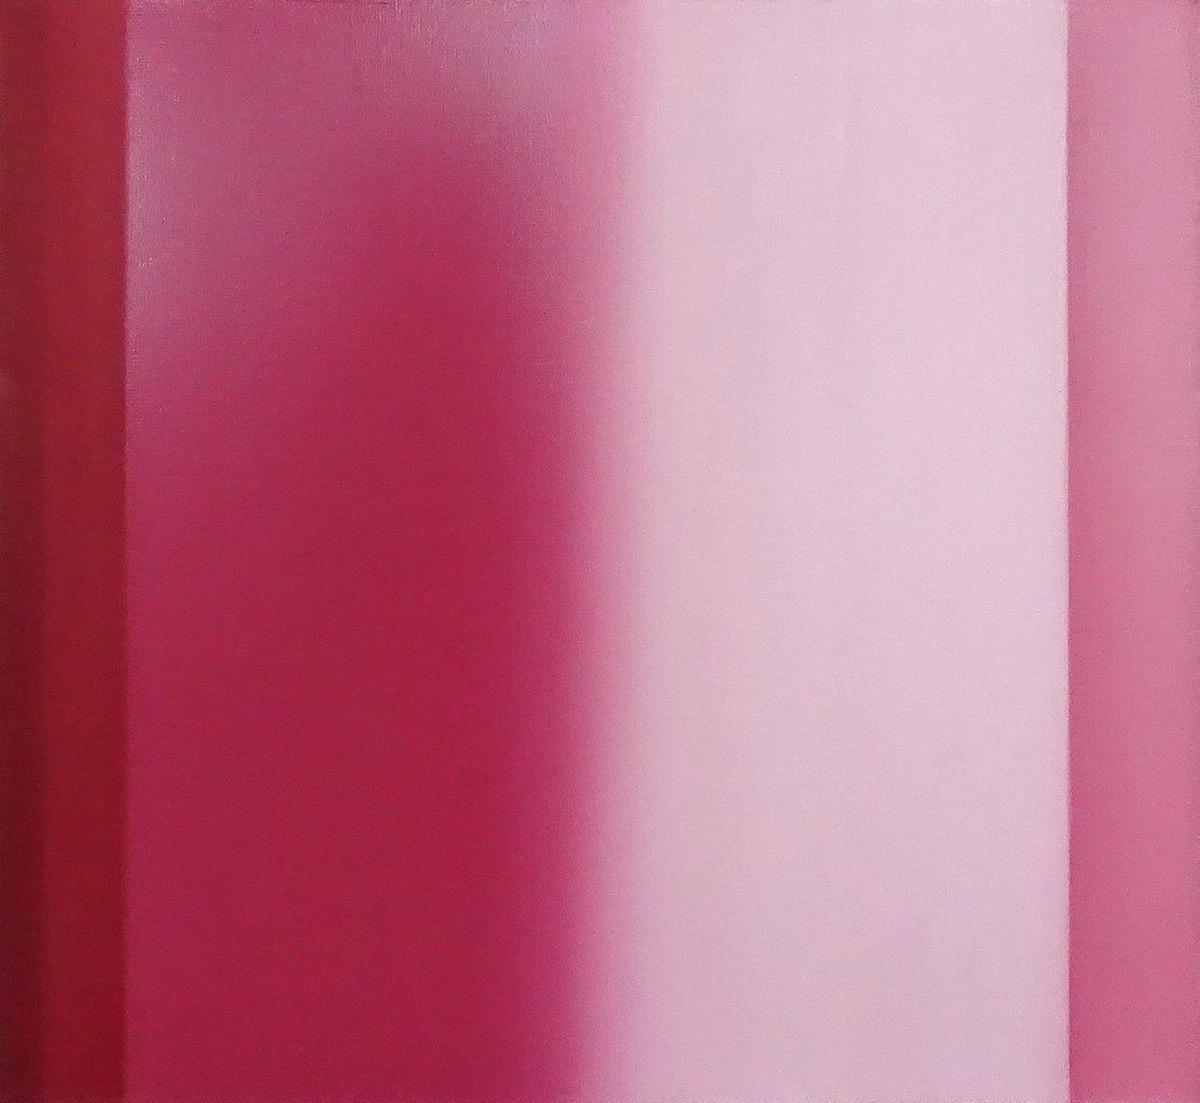 Anna Podlewska : Passage in purple